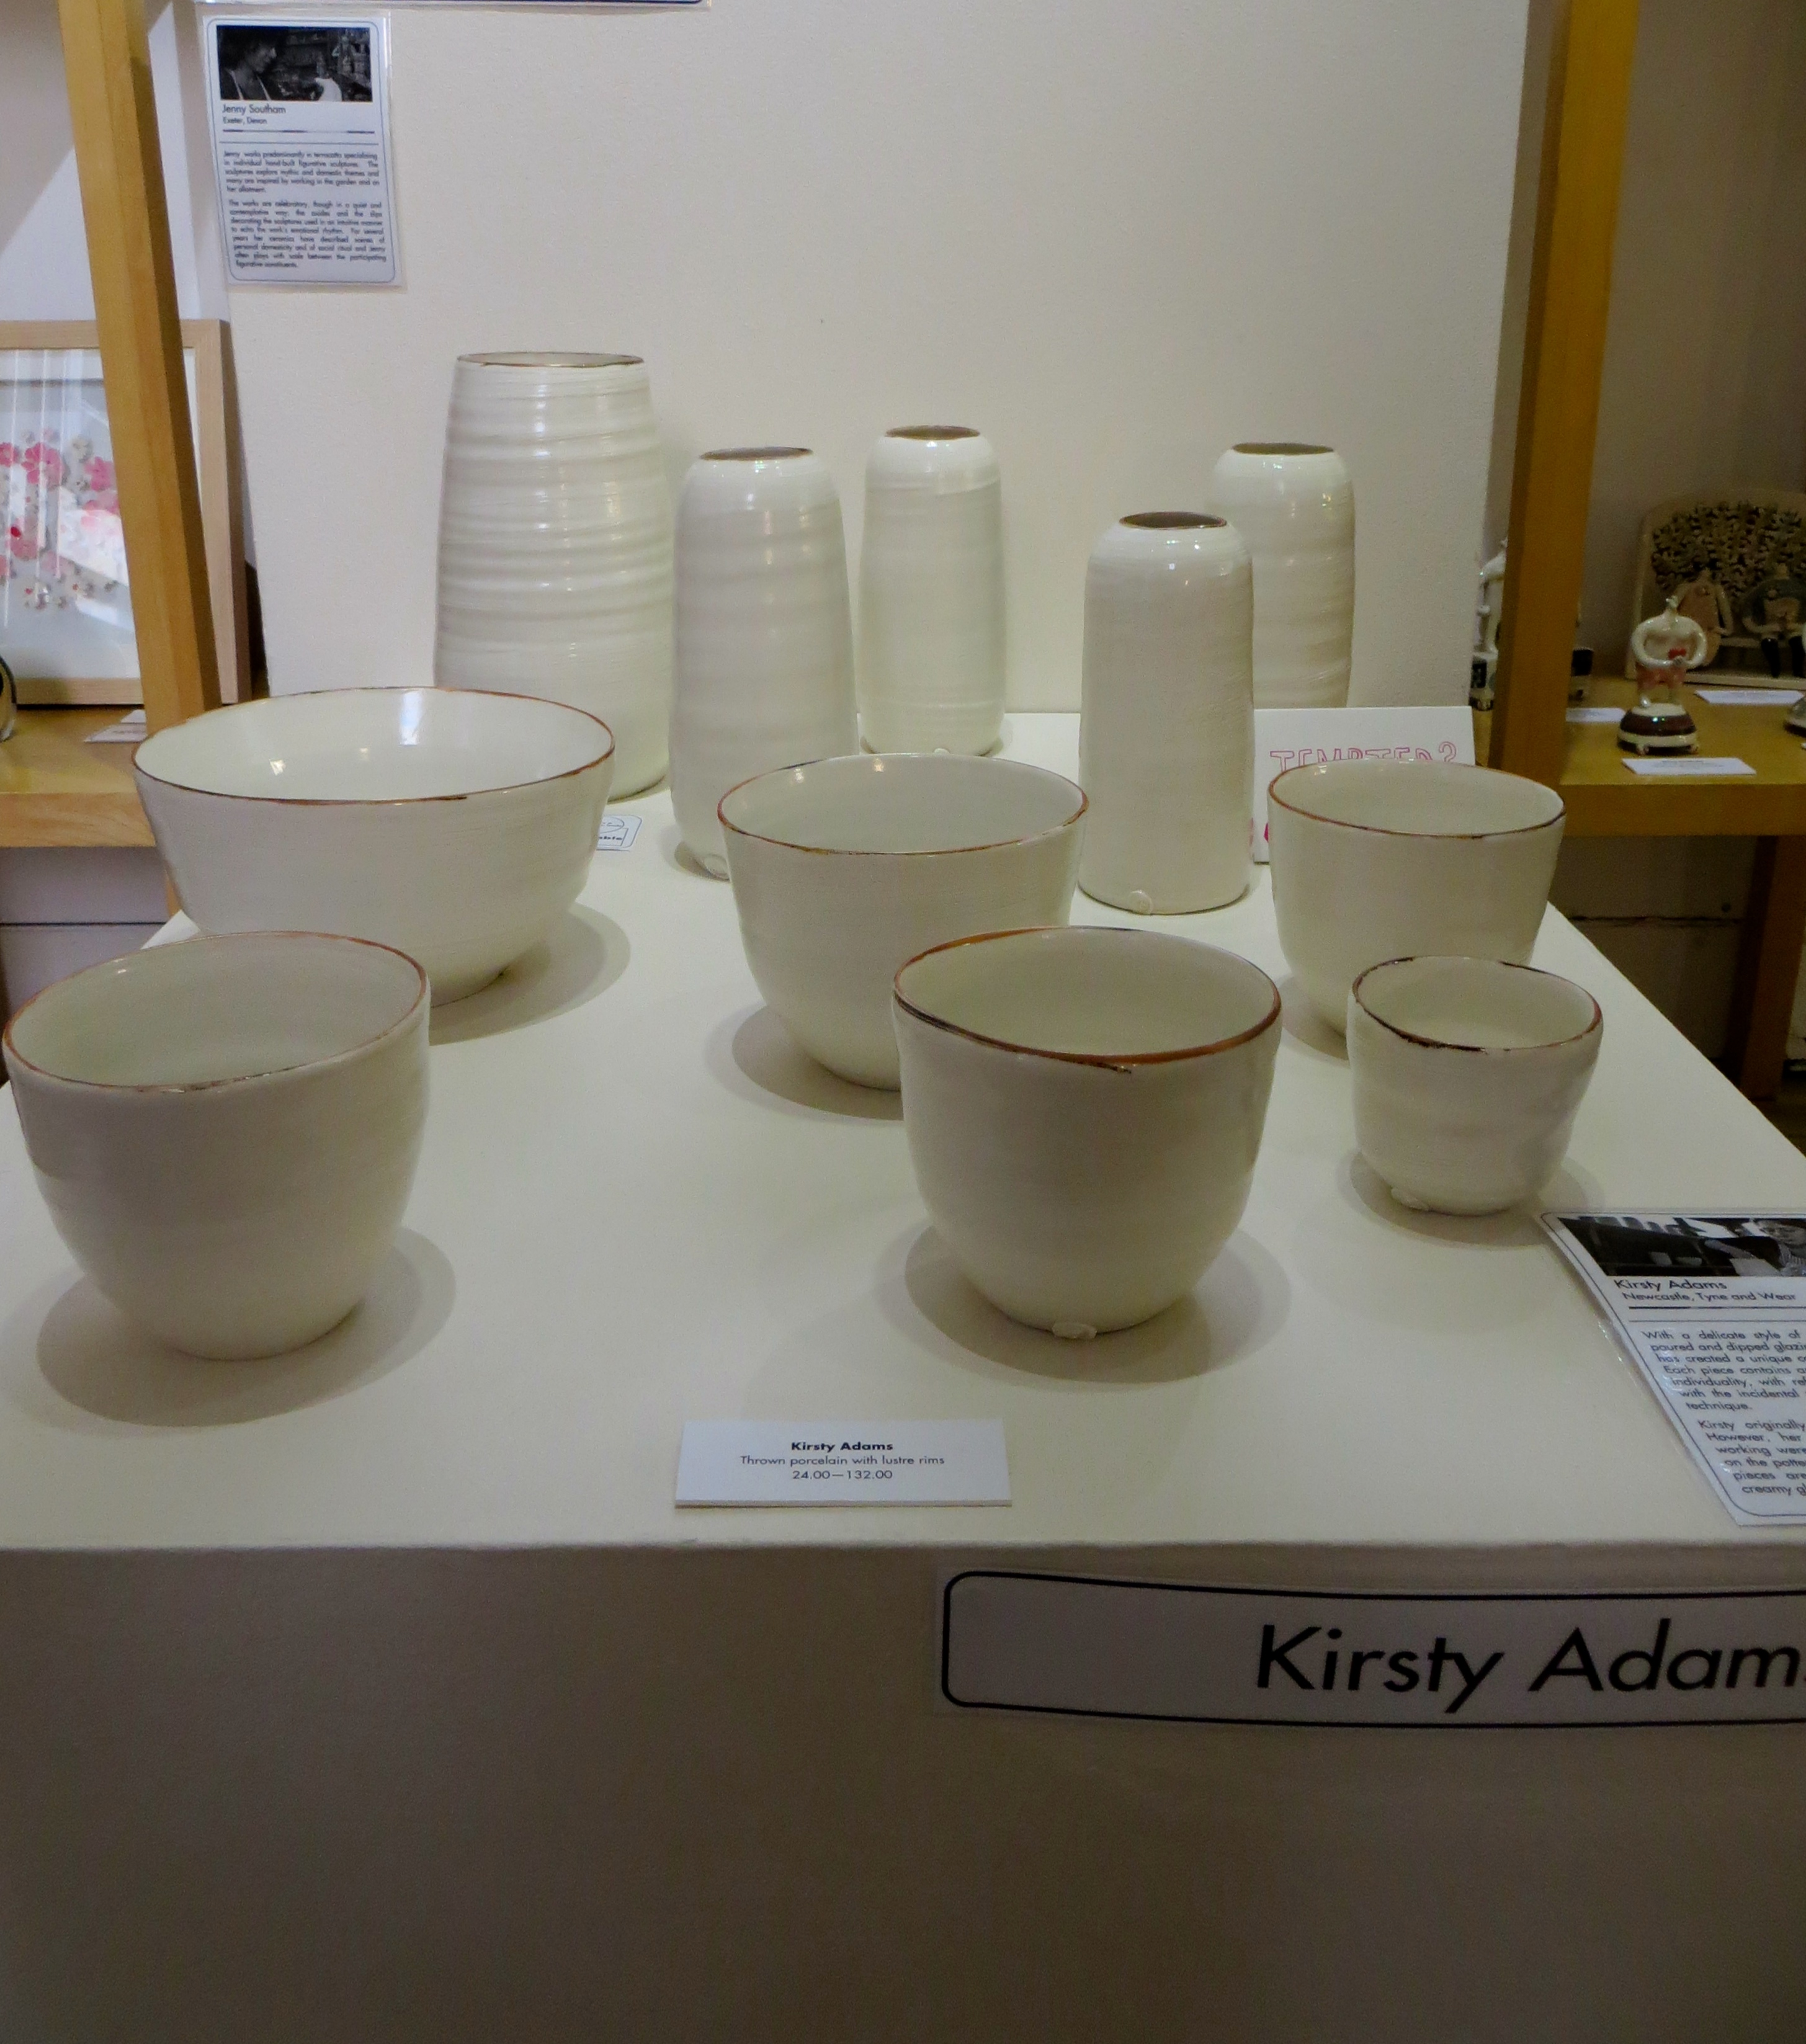 Kirsty Adams